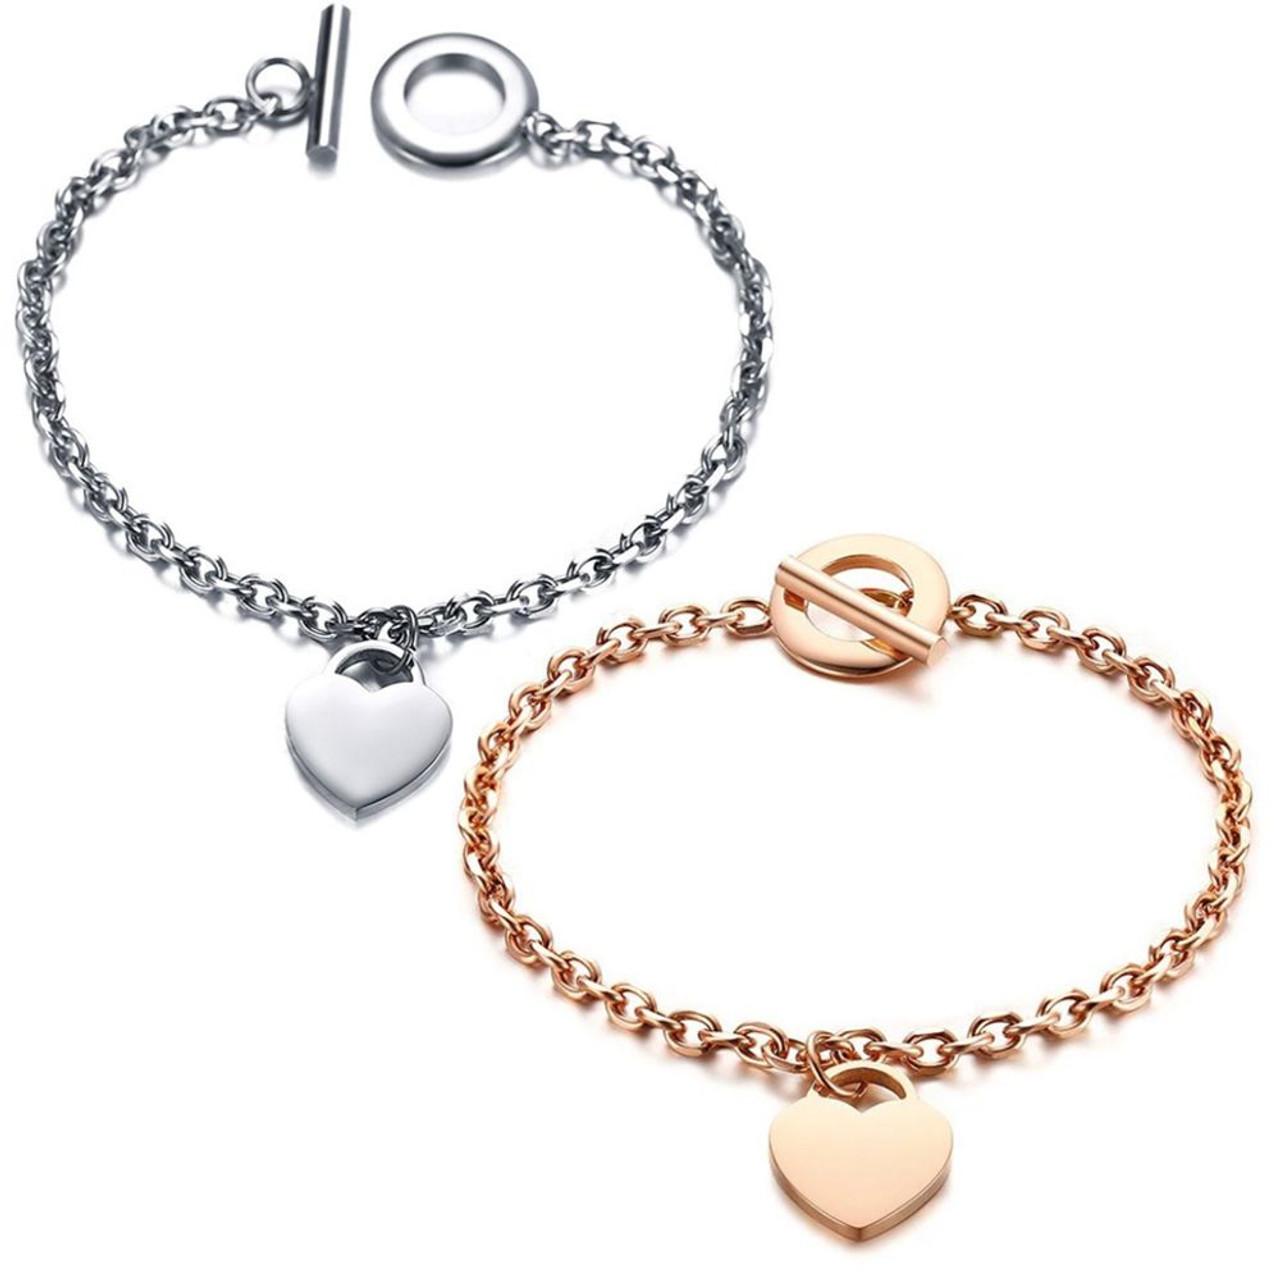 Stainless Steel Christmas Heart Bracelet Free Personalised Engraving /& Gift Box